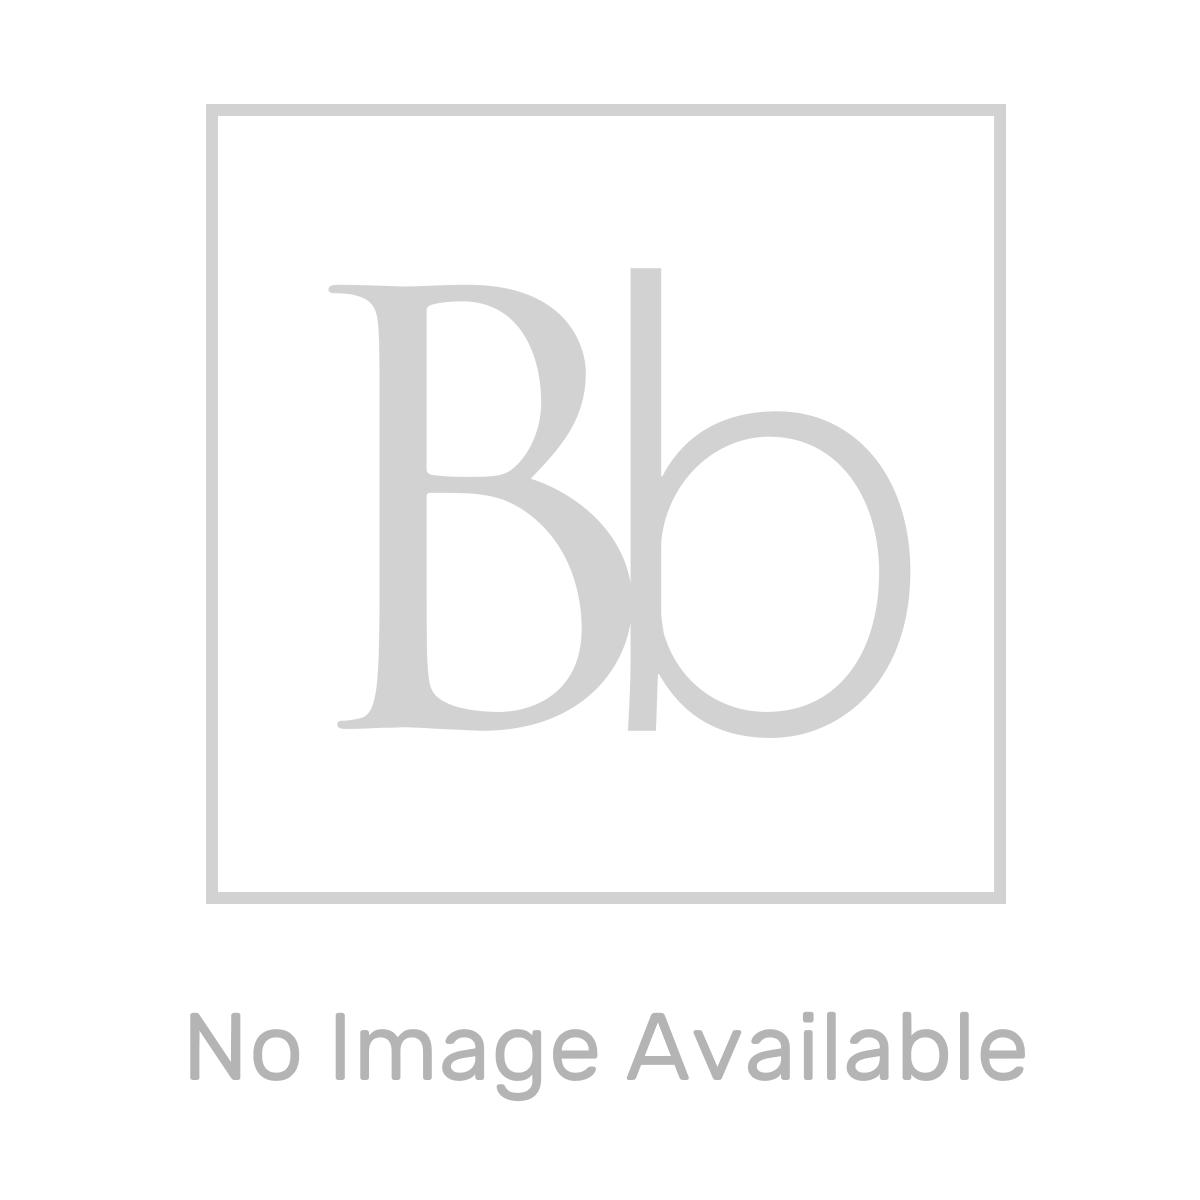 Kartell Purity White 2 Drawer Floor Standing Vanity Unit 600mm